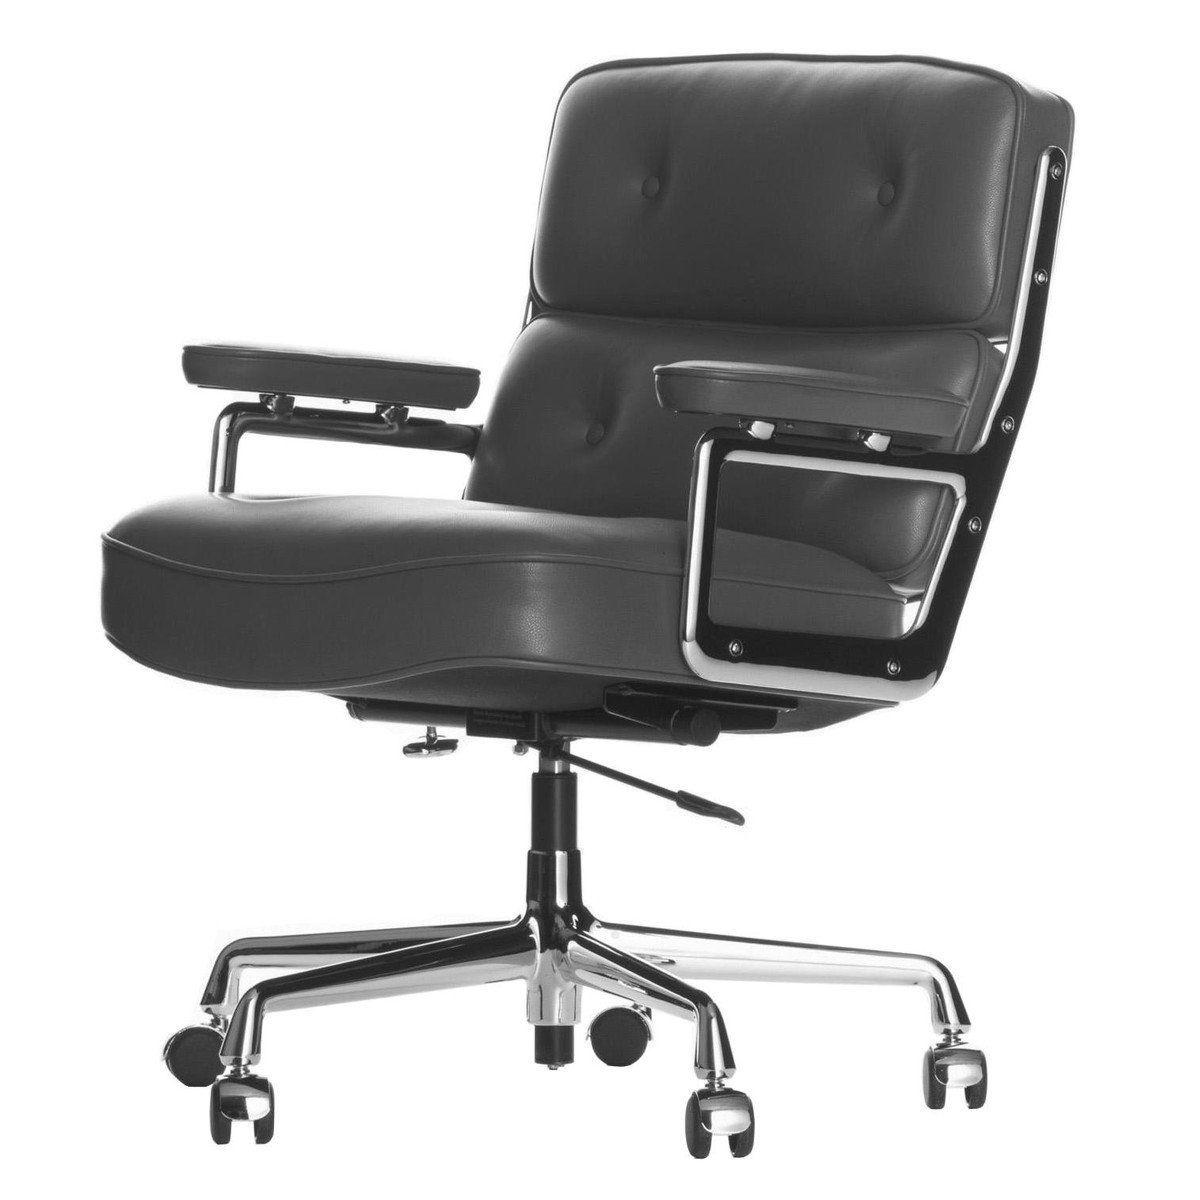 Bürostuhl Vitra vitra es 104 eames lobby chair bürostuhl vitra ambientedirect com